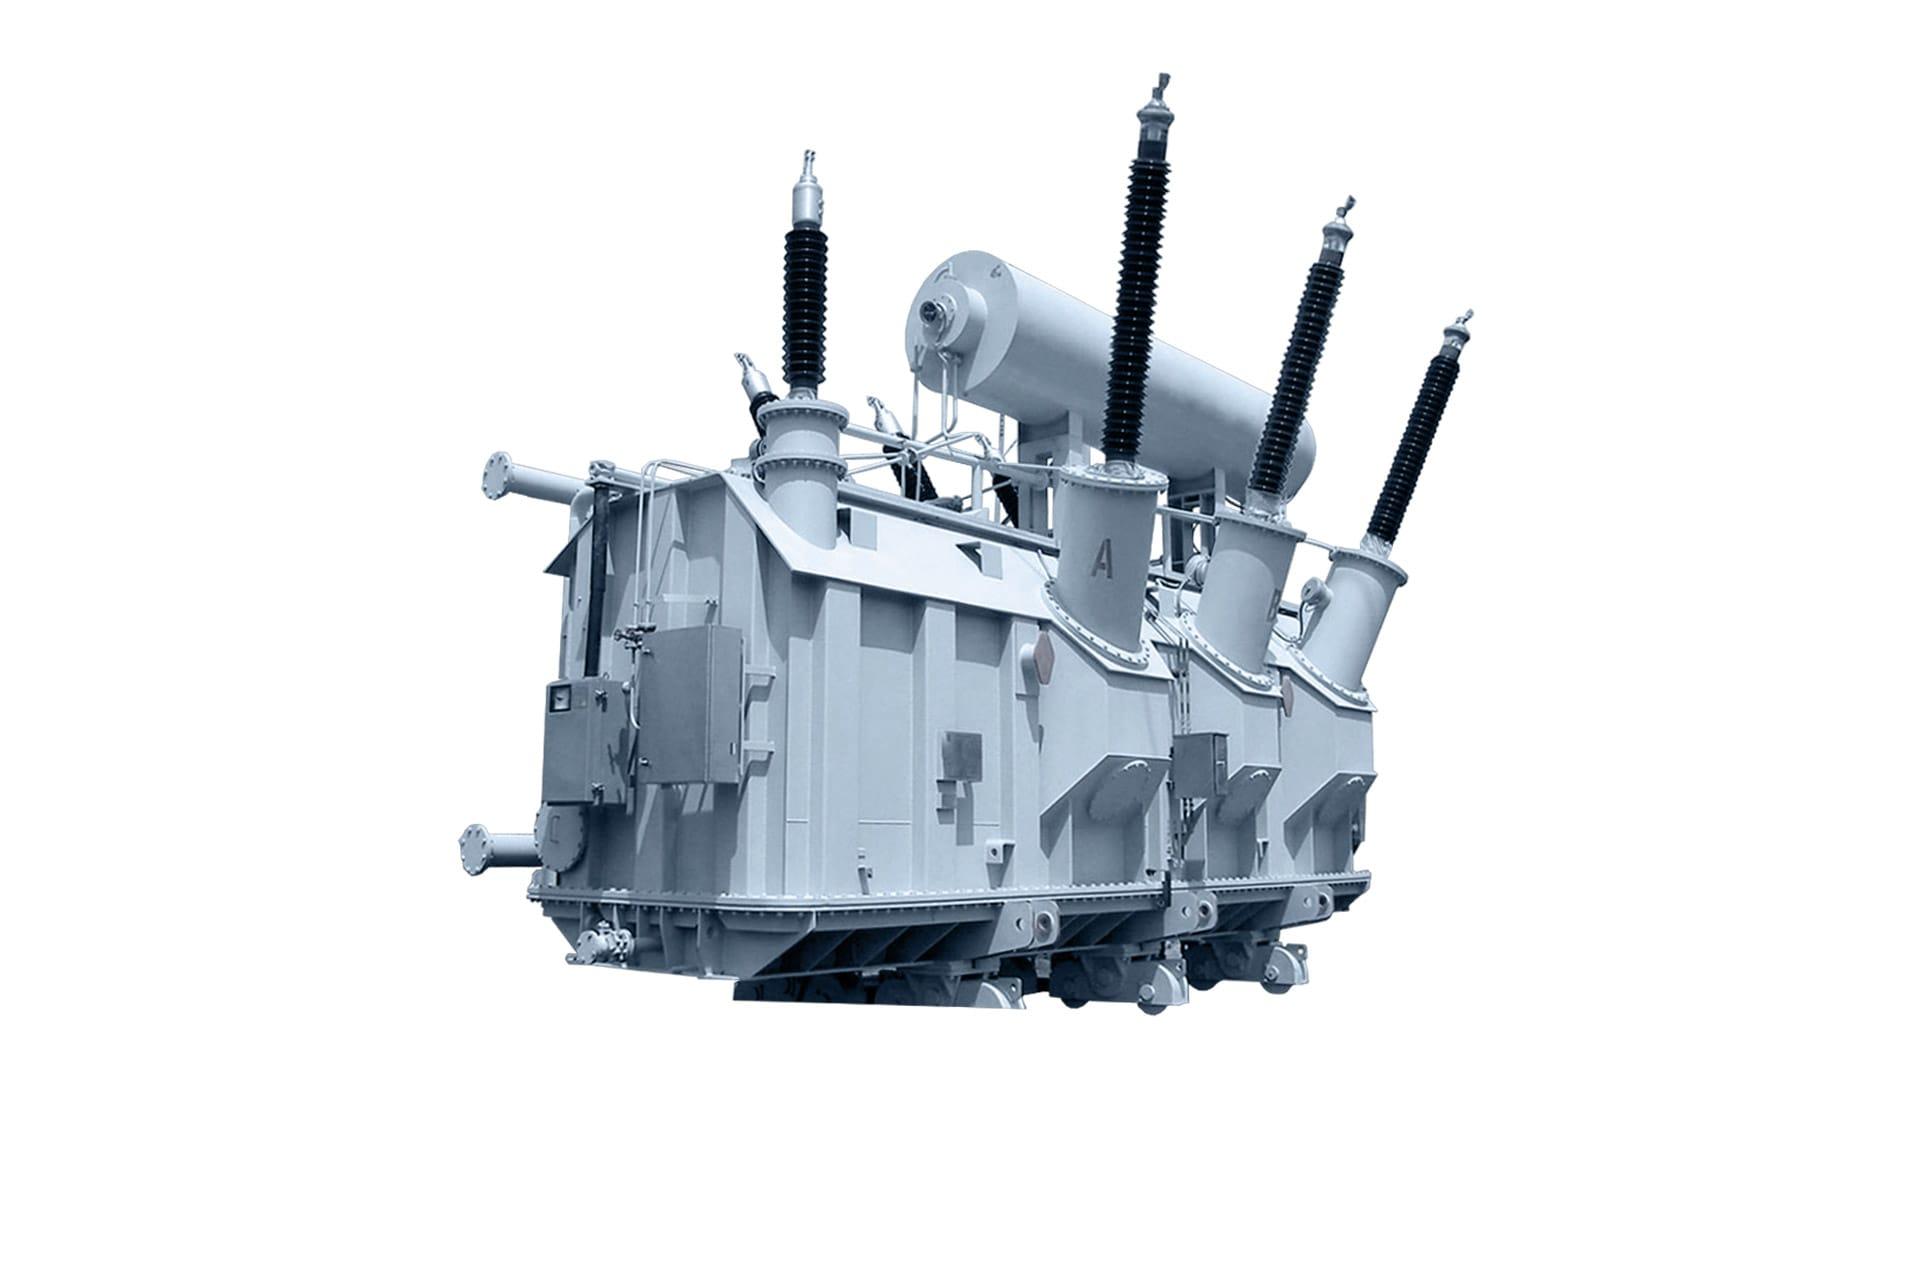 Ensons - Общий вид масляного трансформатора ТРДЦН 220 кВ